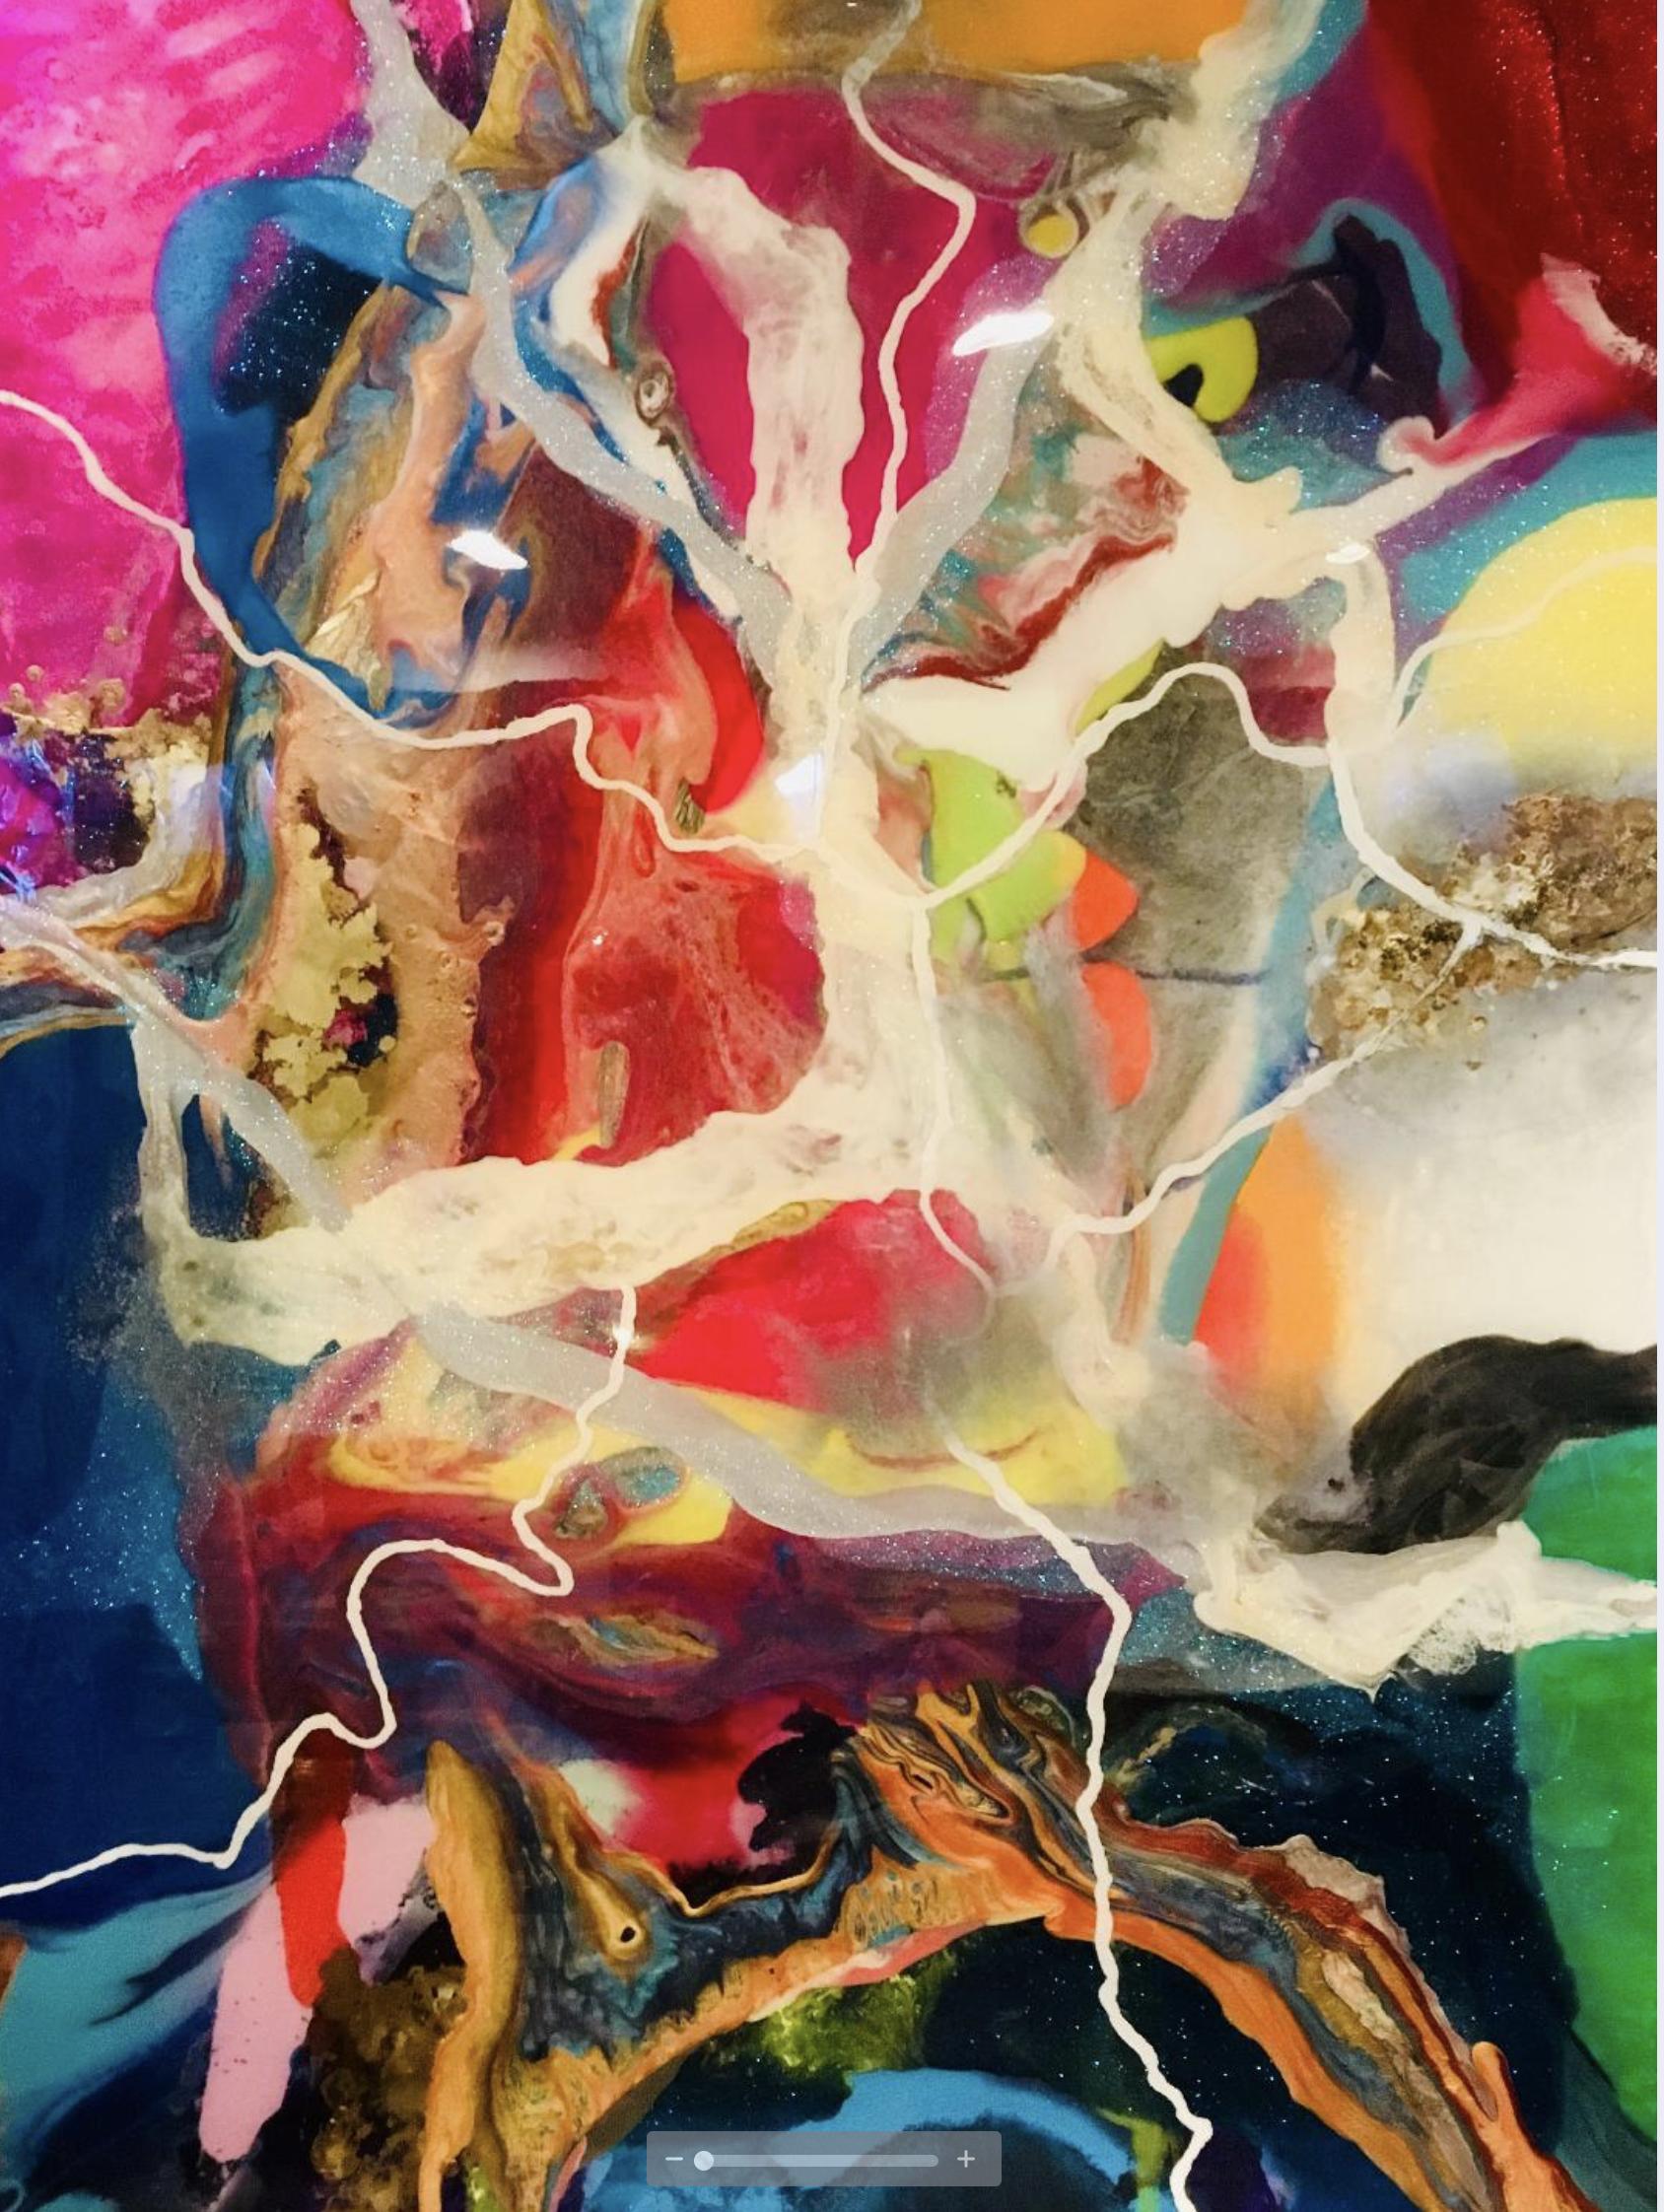 New World, 2018, mixed media on cradled birch, 36 x 36, $6,000